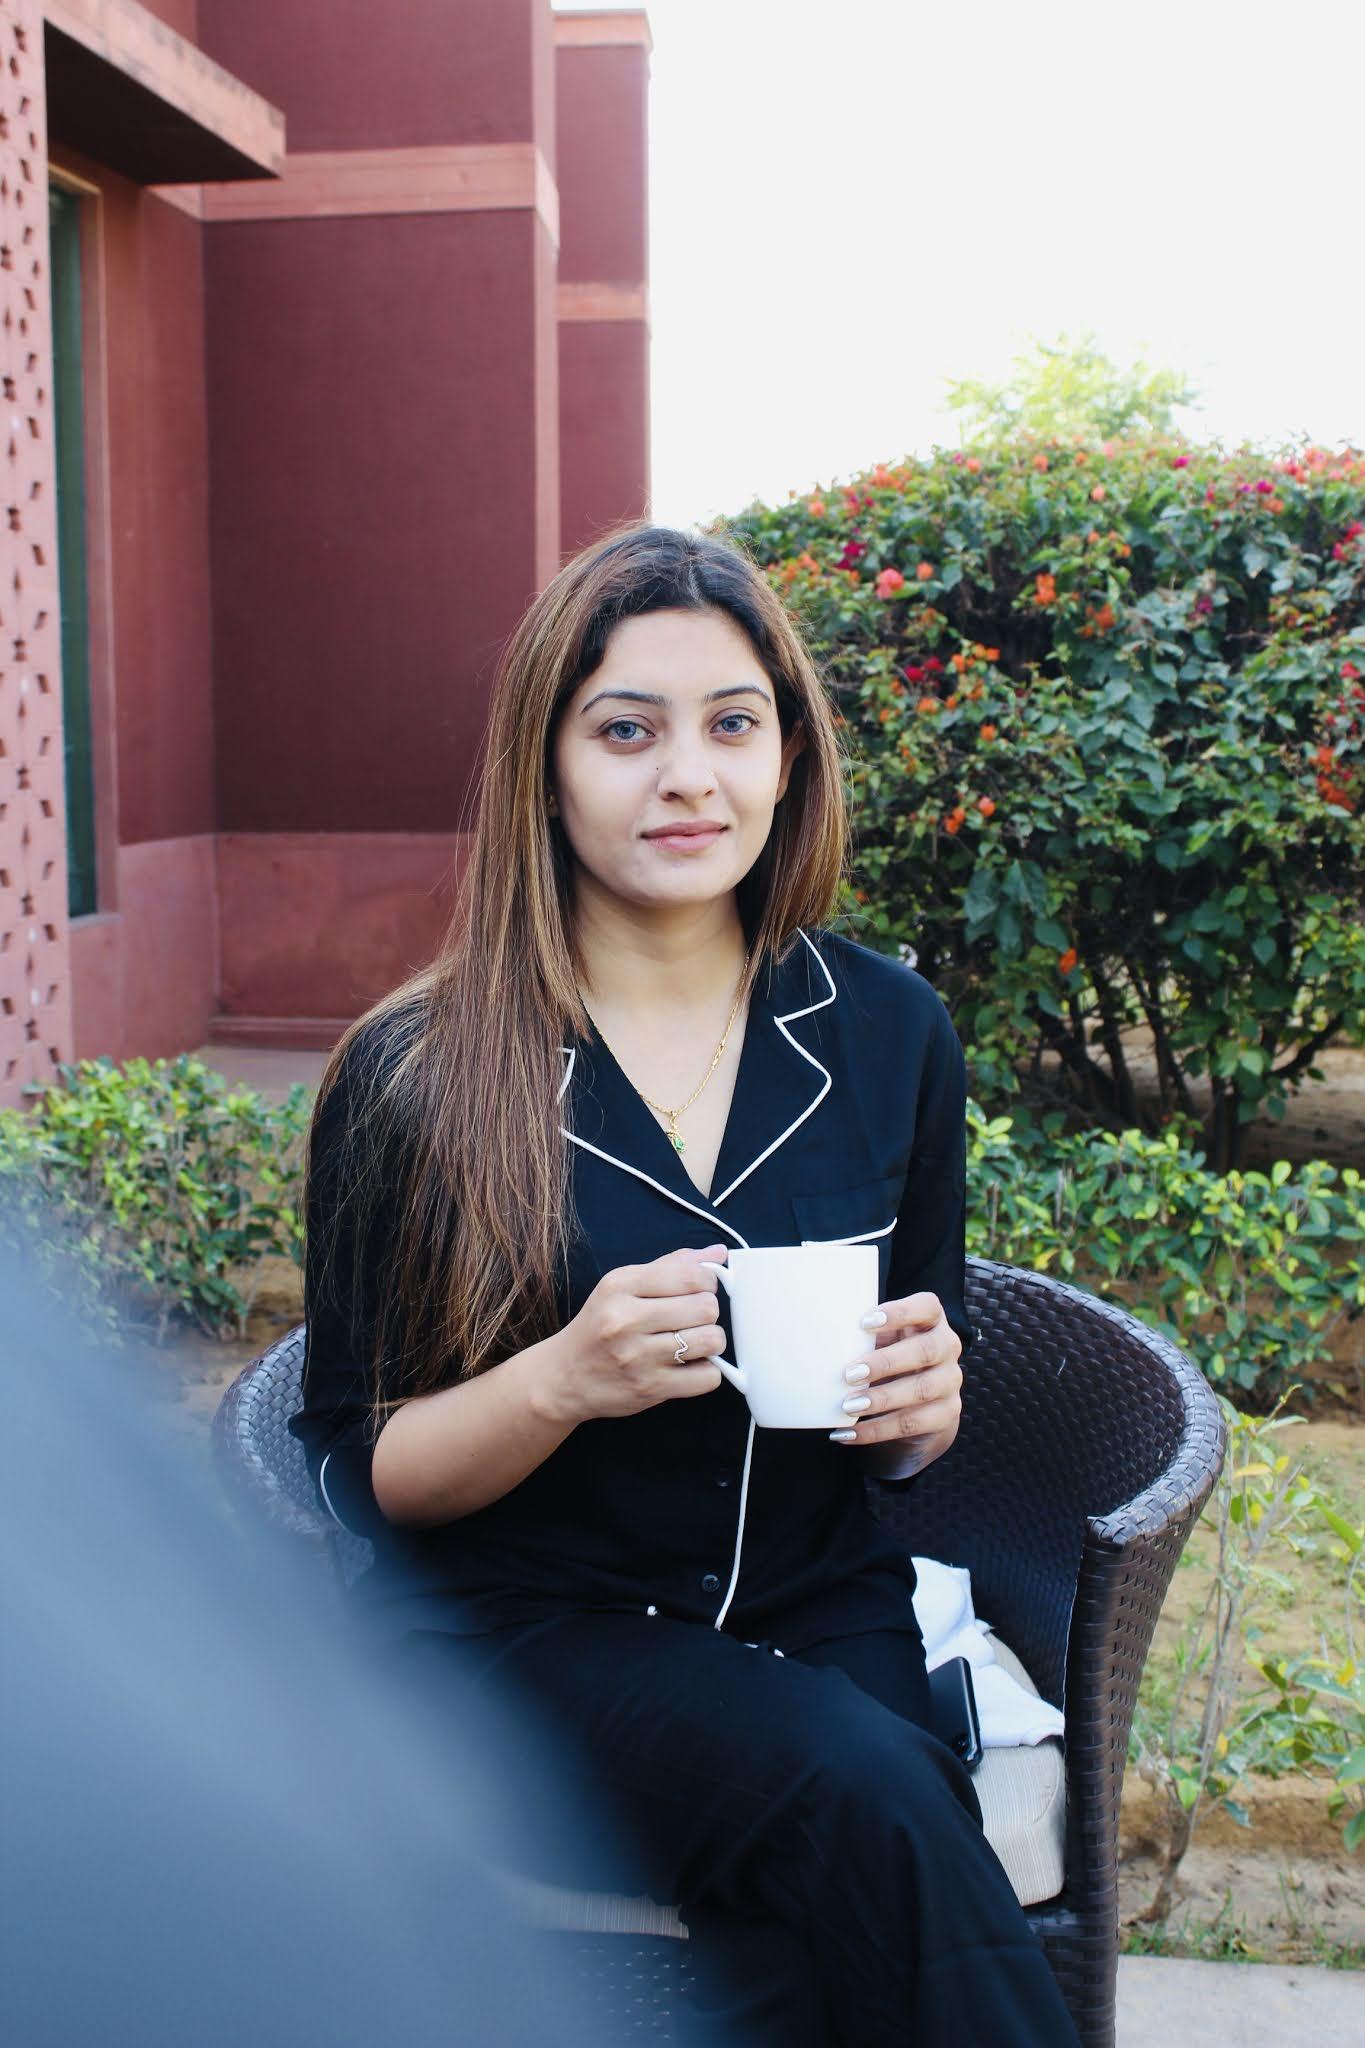 Priya-Gautam-Why-do-we-need-the-fear-of-coronavirus-to-be-cautious-on-Holi